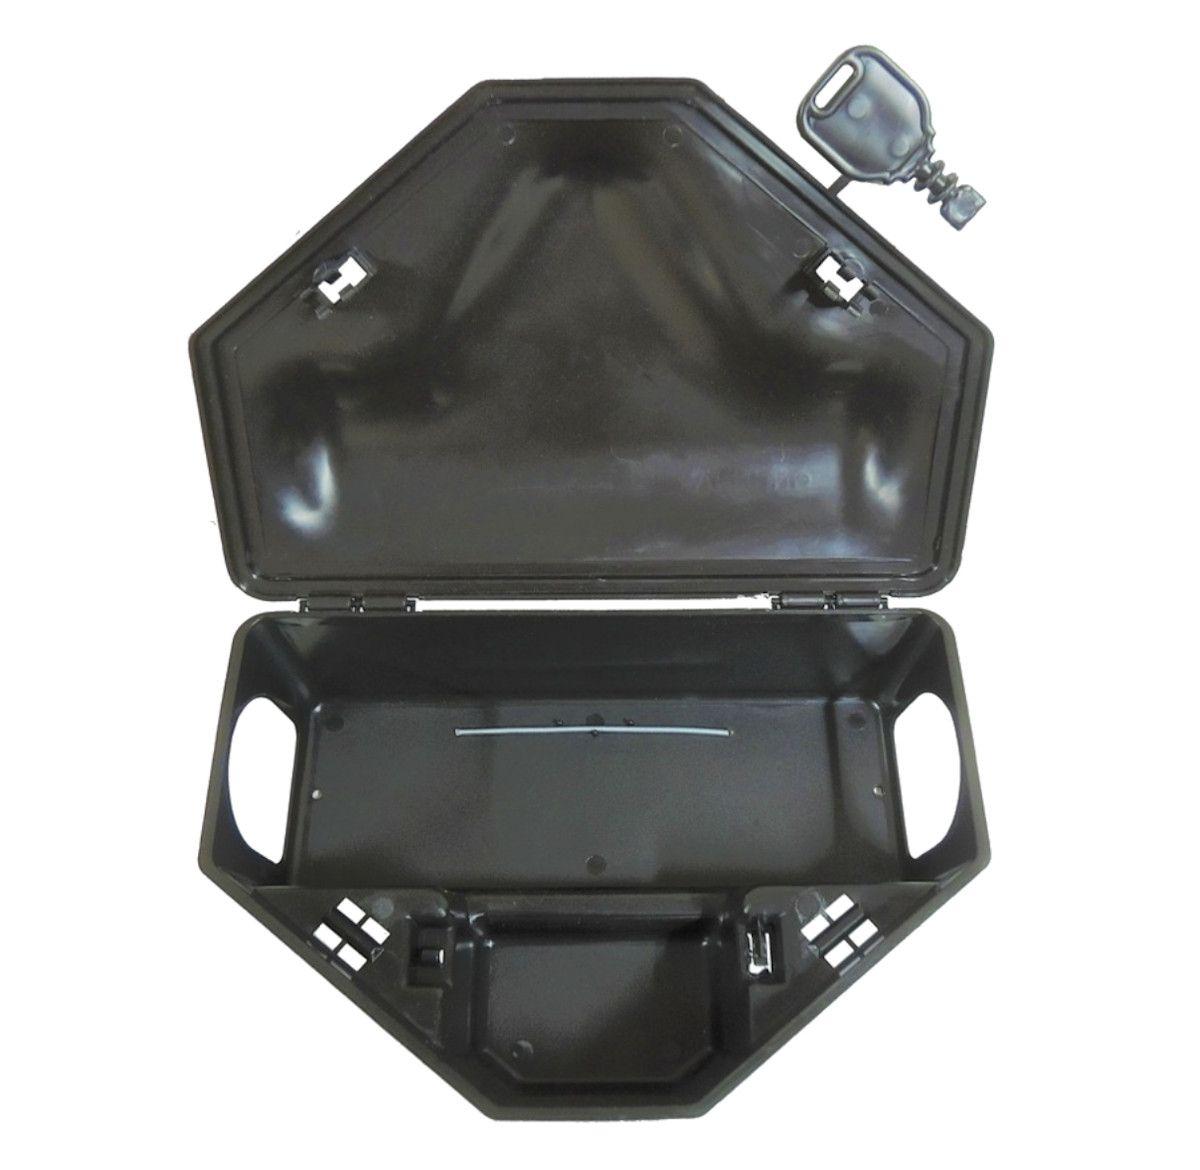 Kit 46 Porta Isca Com 2 Chaves - Duplo Travamento